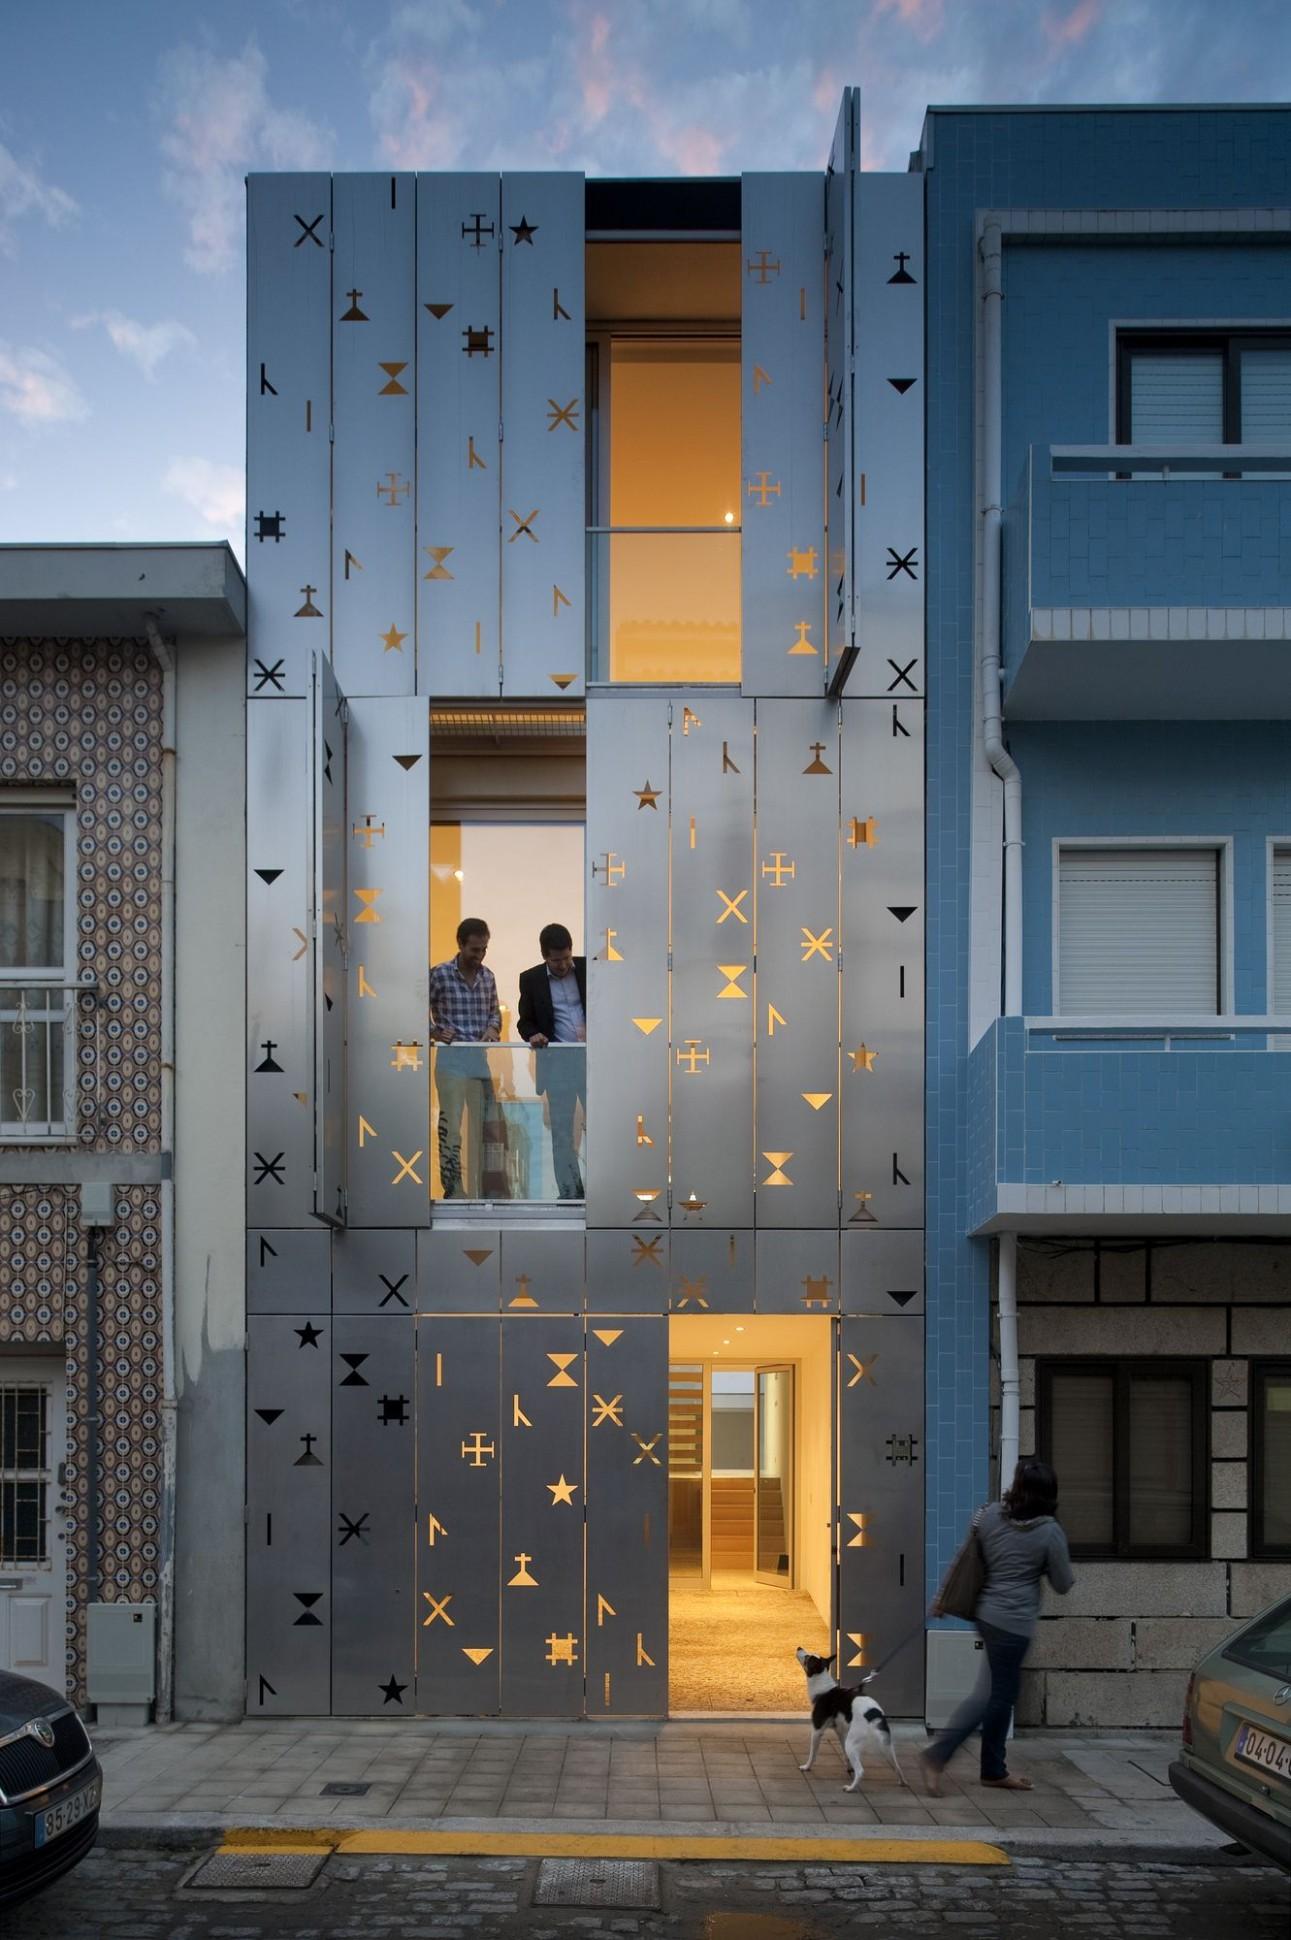 12 Cool Building Facades Featuring Unconventional Design Strategies - Apartment Design Facade